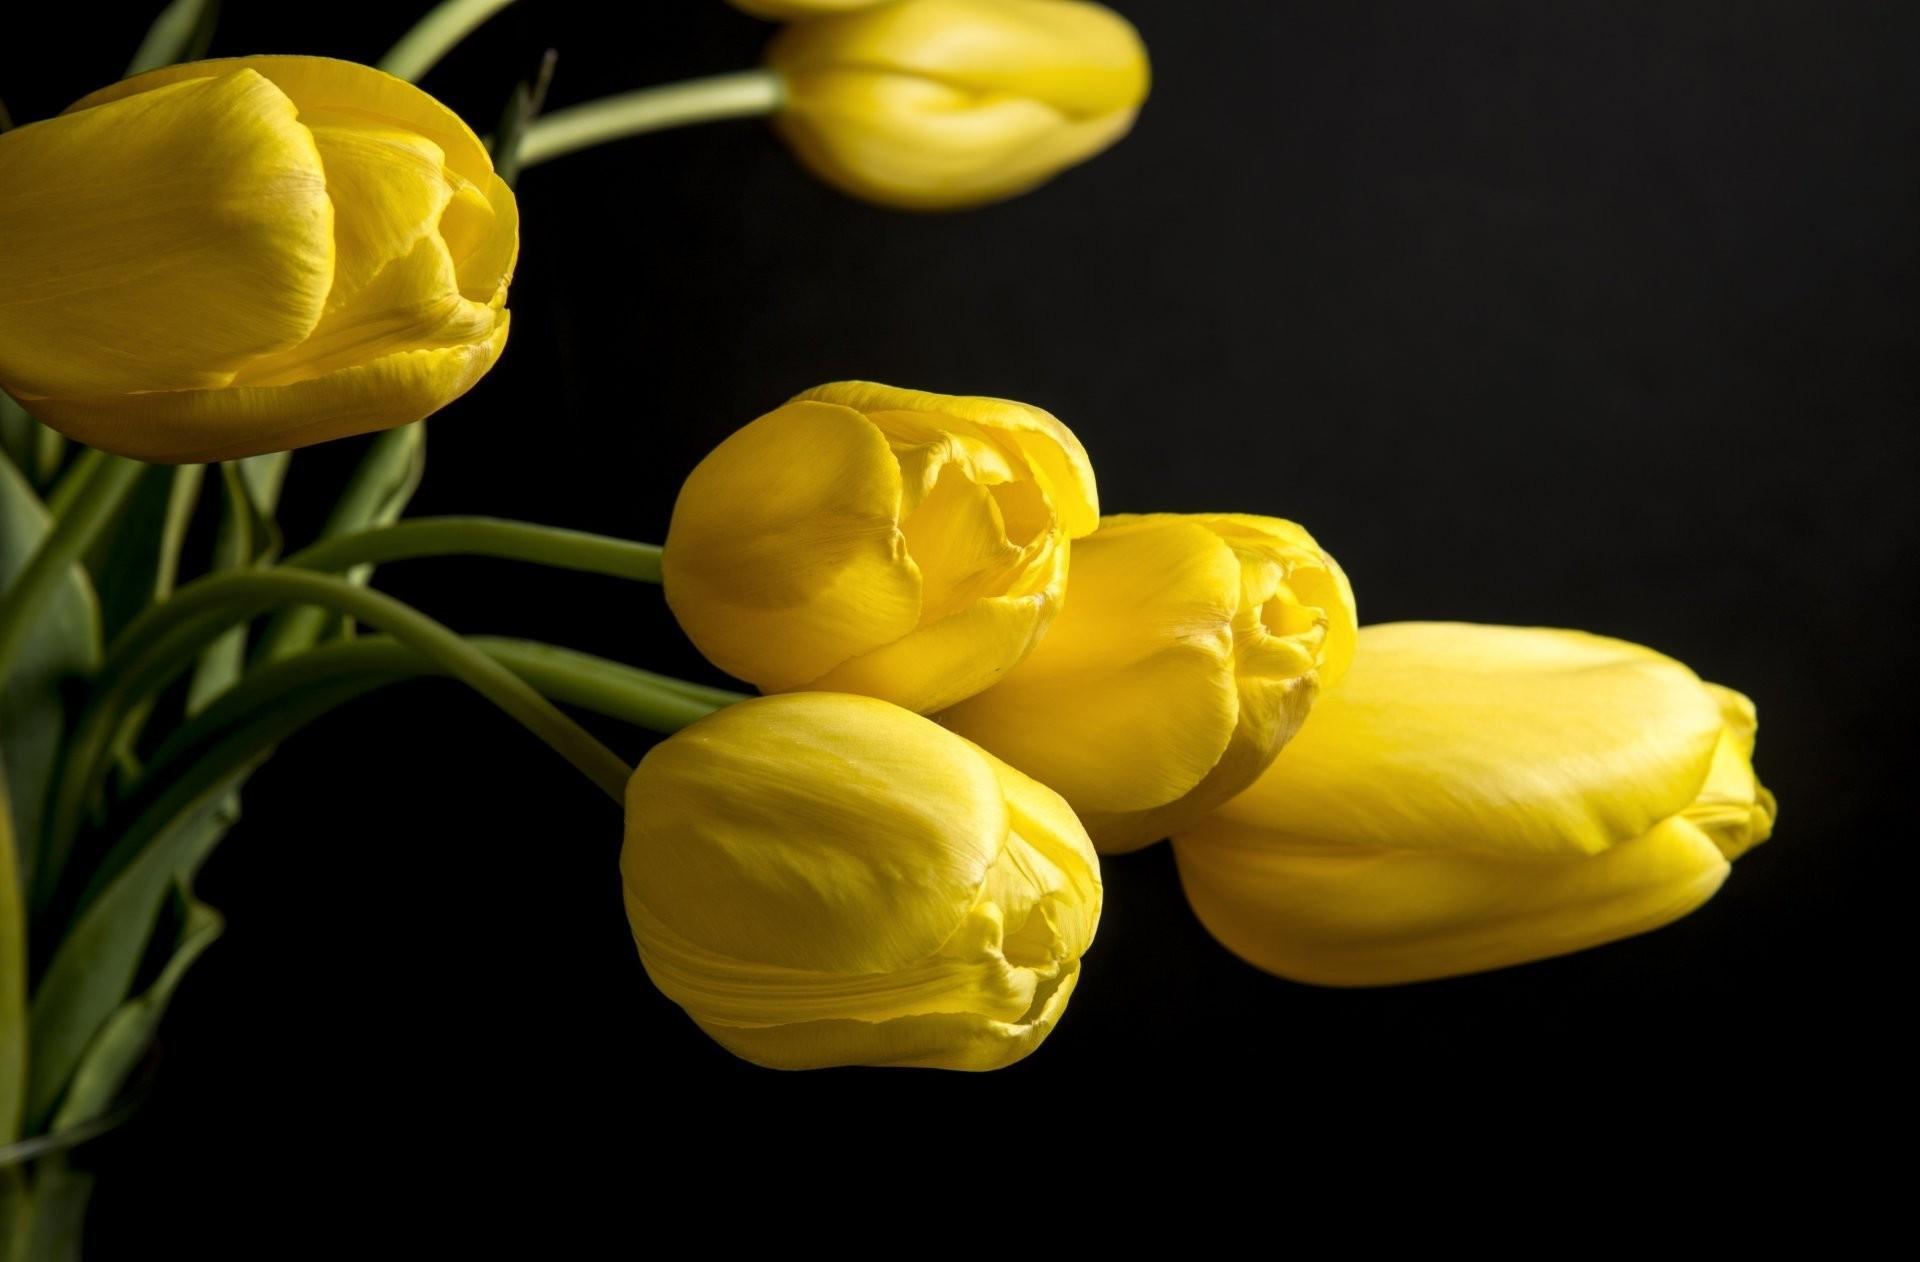 tulips flower petals yellow background black